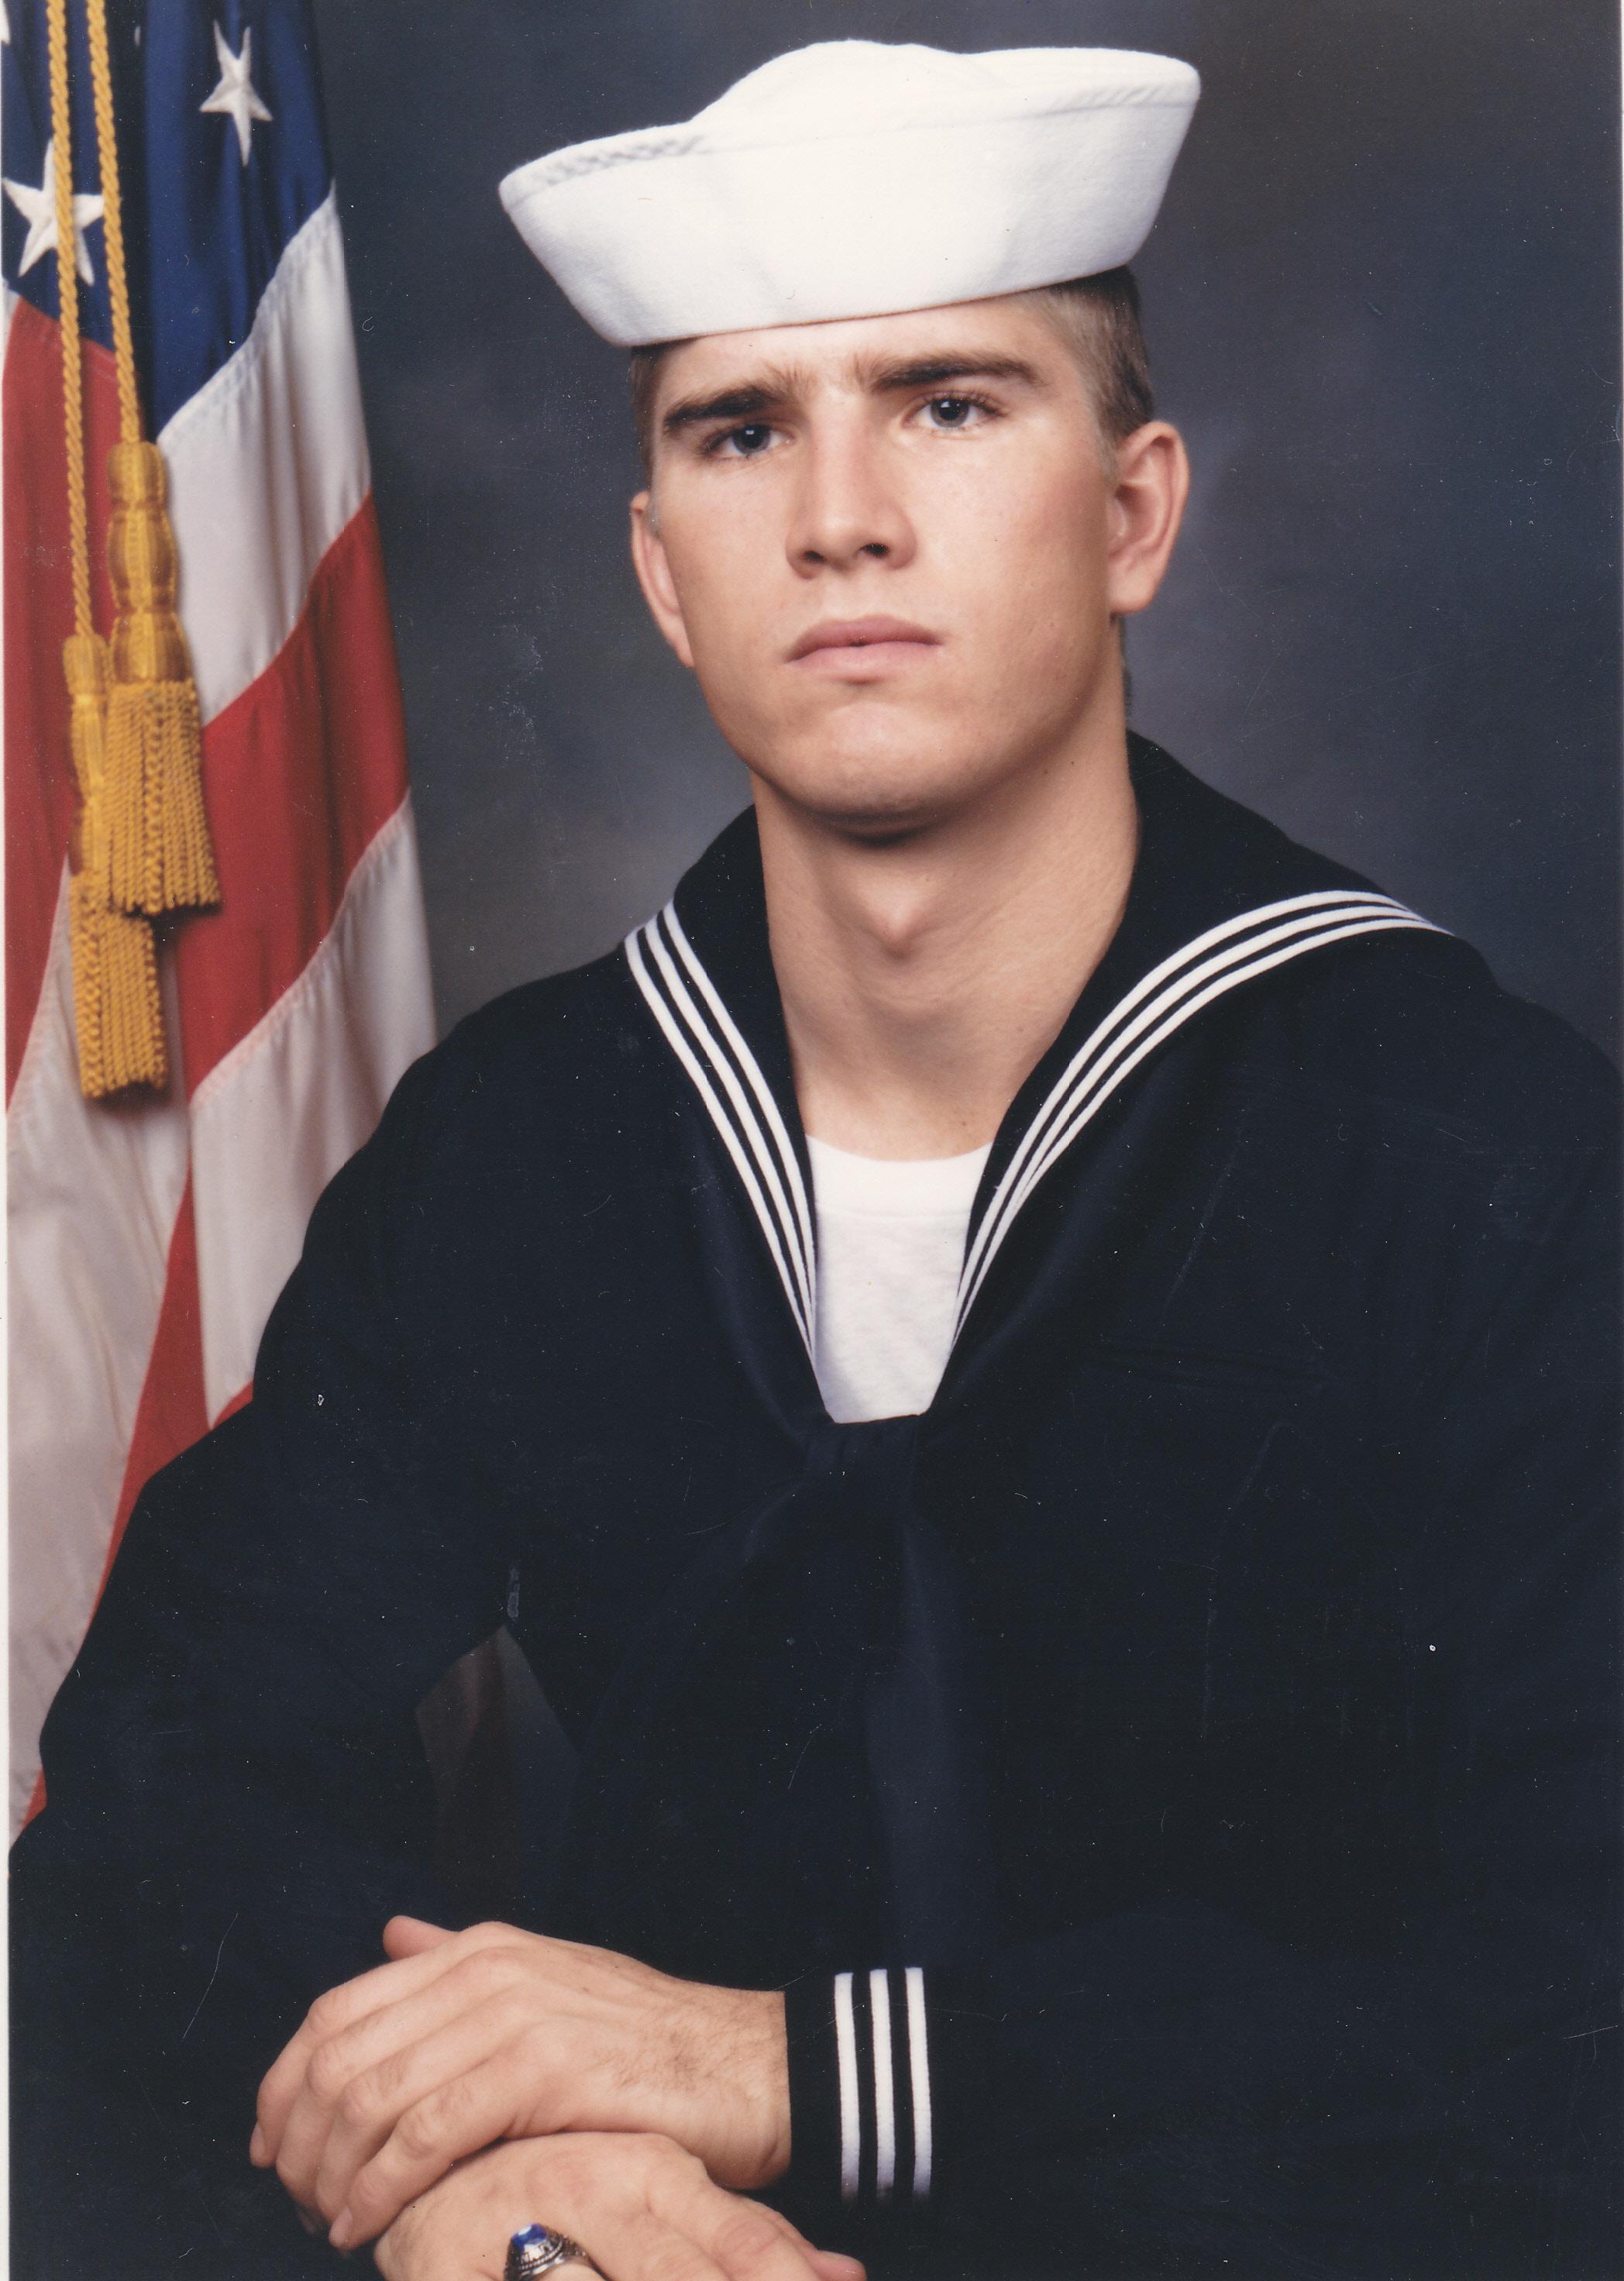 StacyTwiggs Mercury Marine